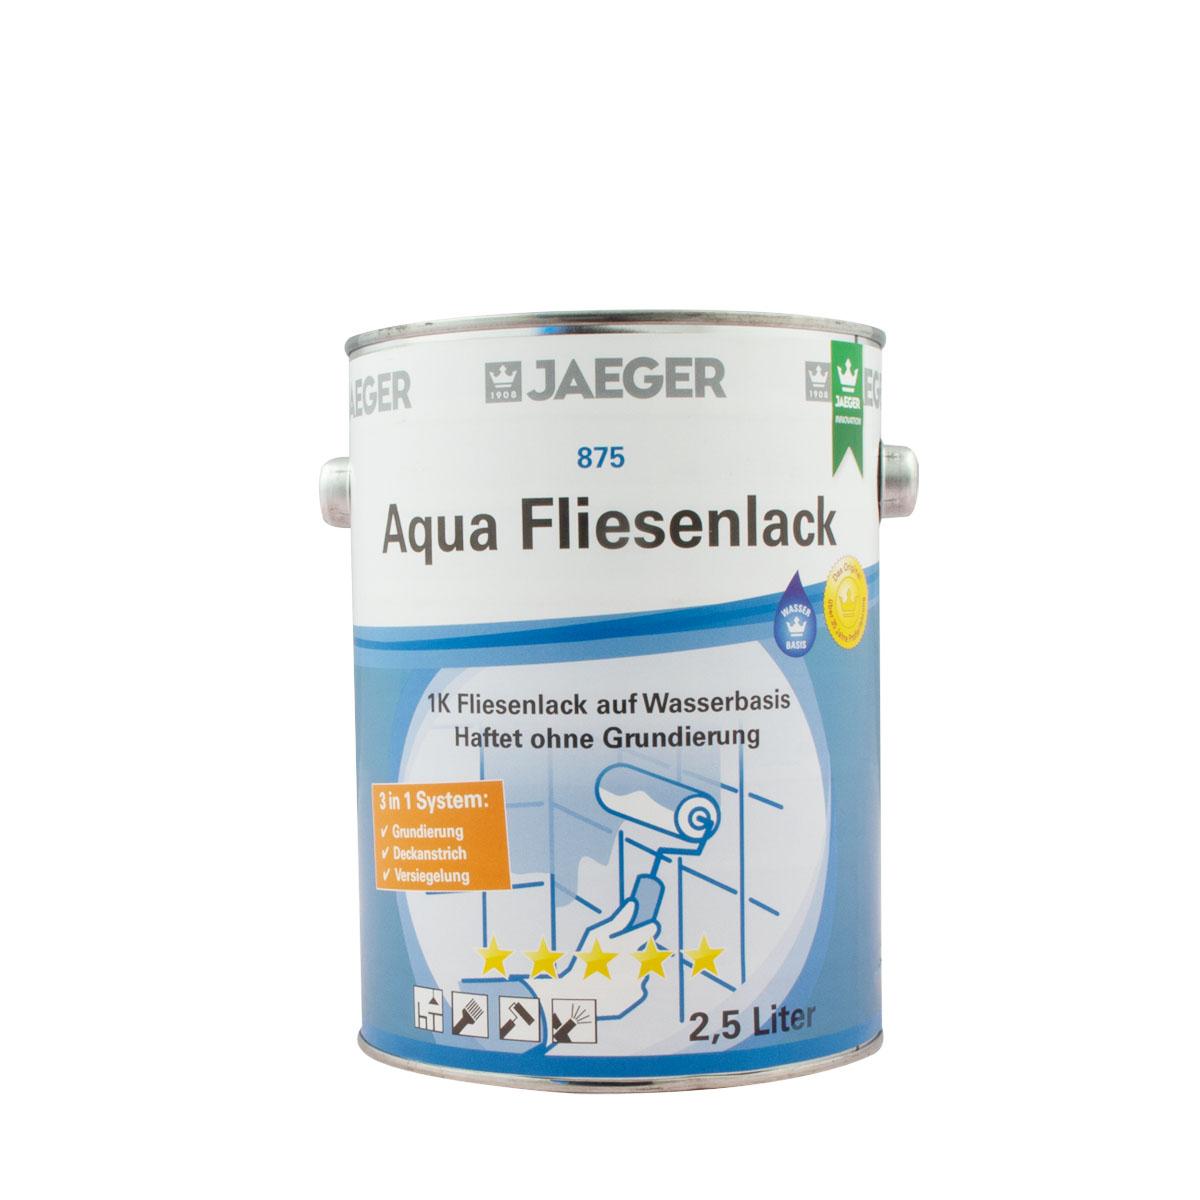 Jaeger Aqua Fliesenlack 875 grafite(dunkelgrau) 2,5L, 3 in 1 System